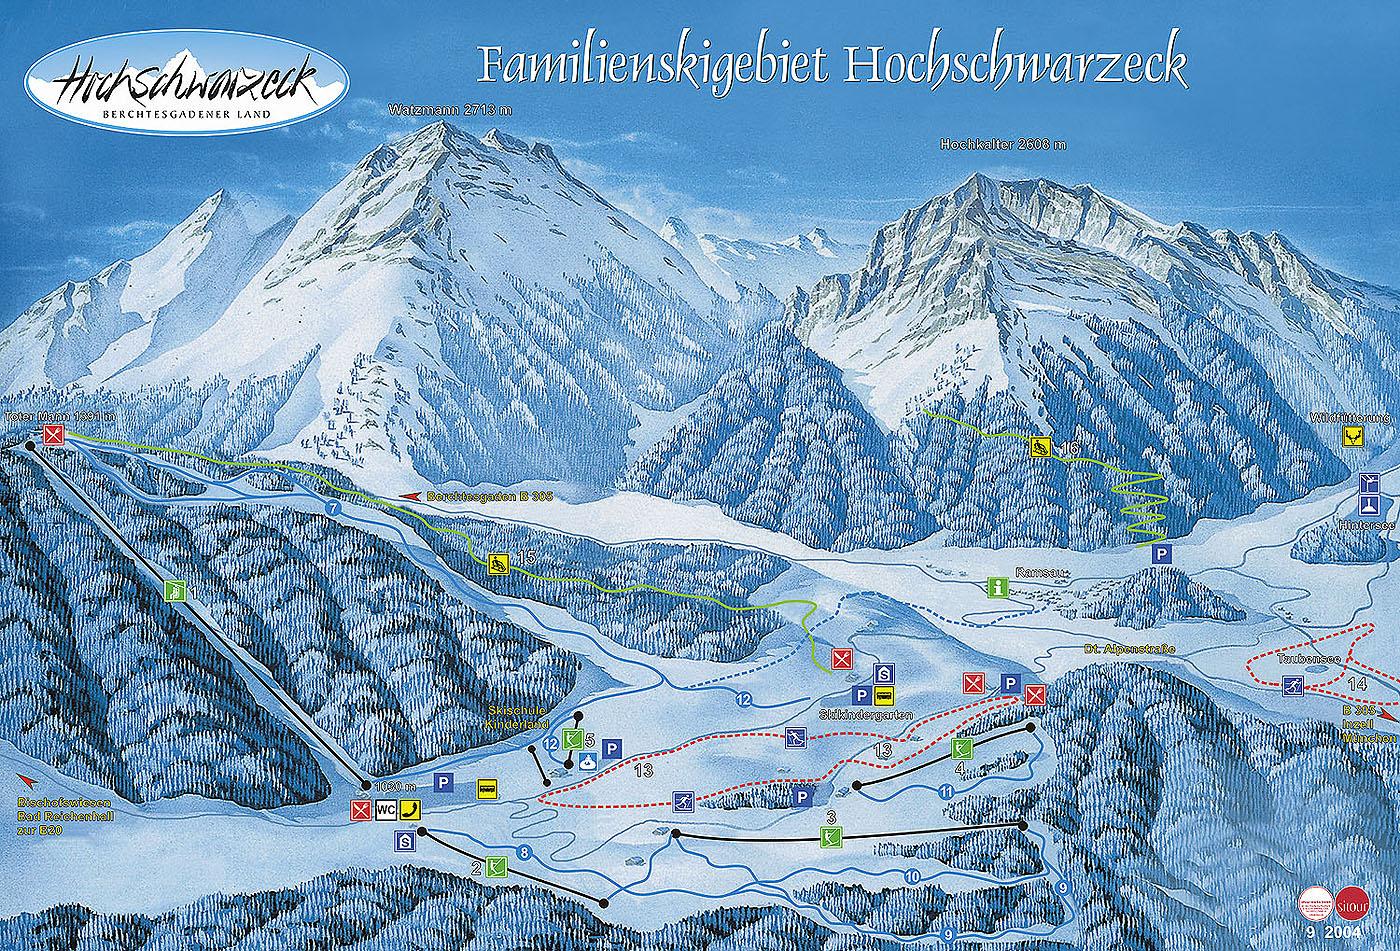 Ramsau/Hochschwarzeck Piste / Trail Map